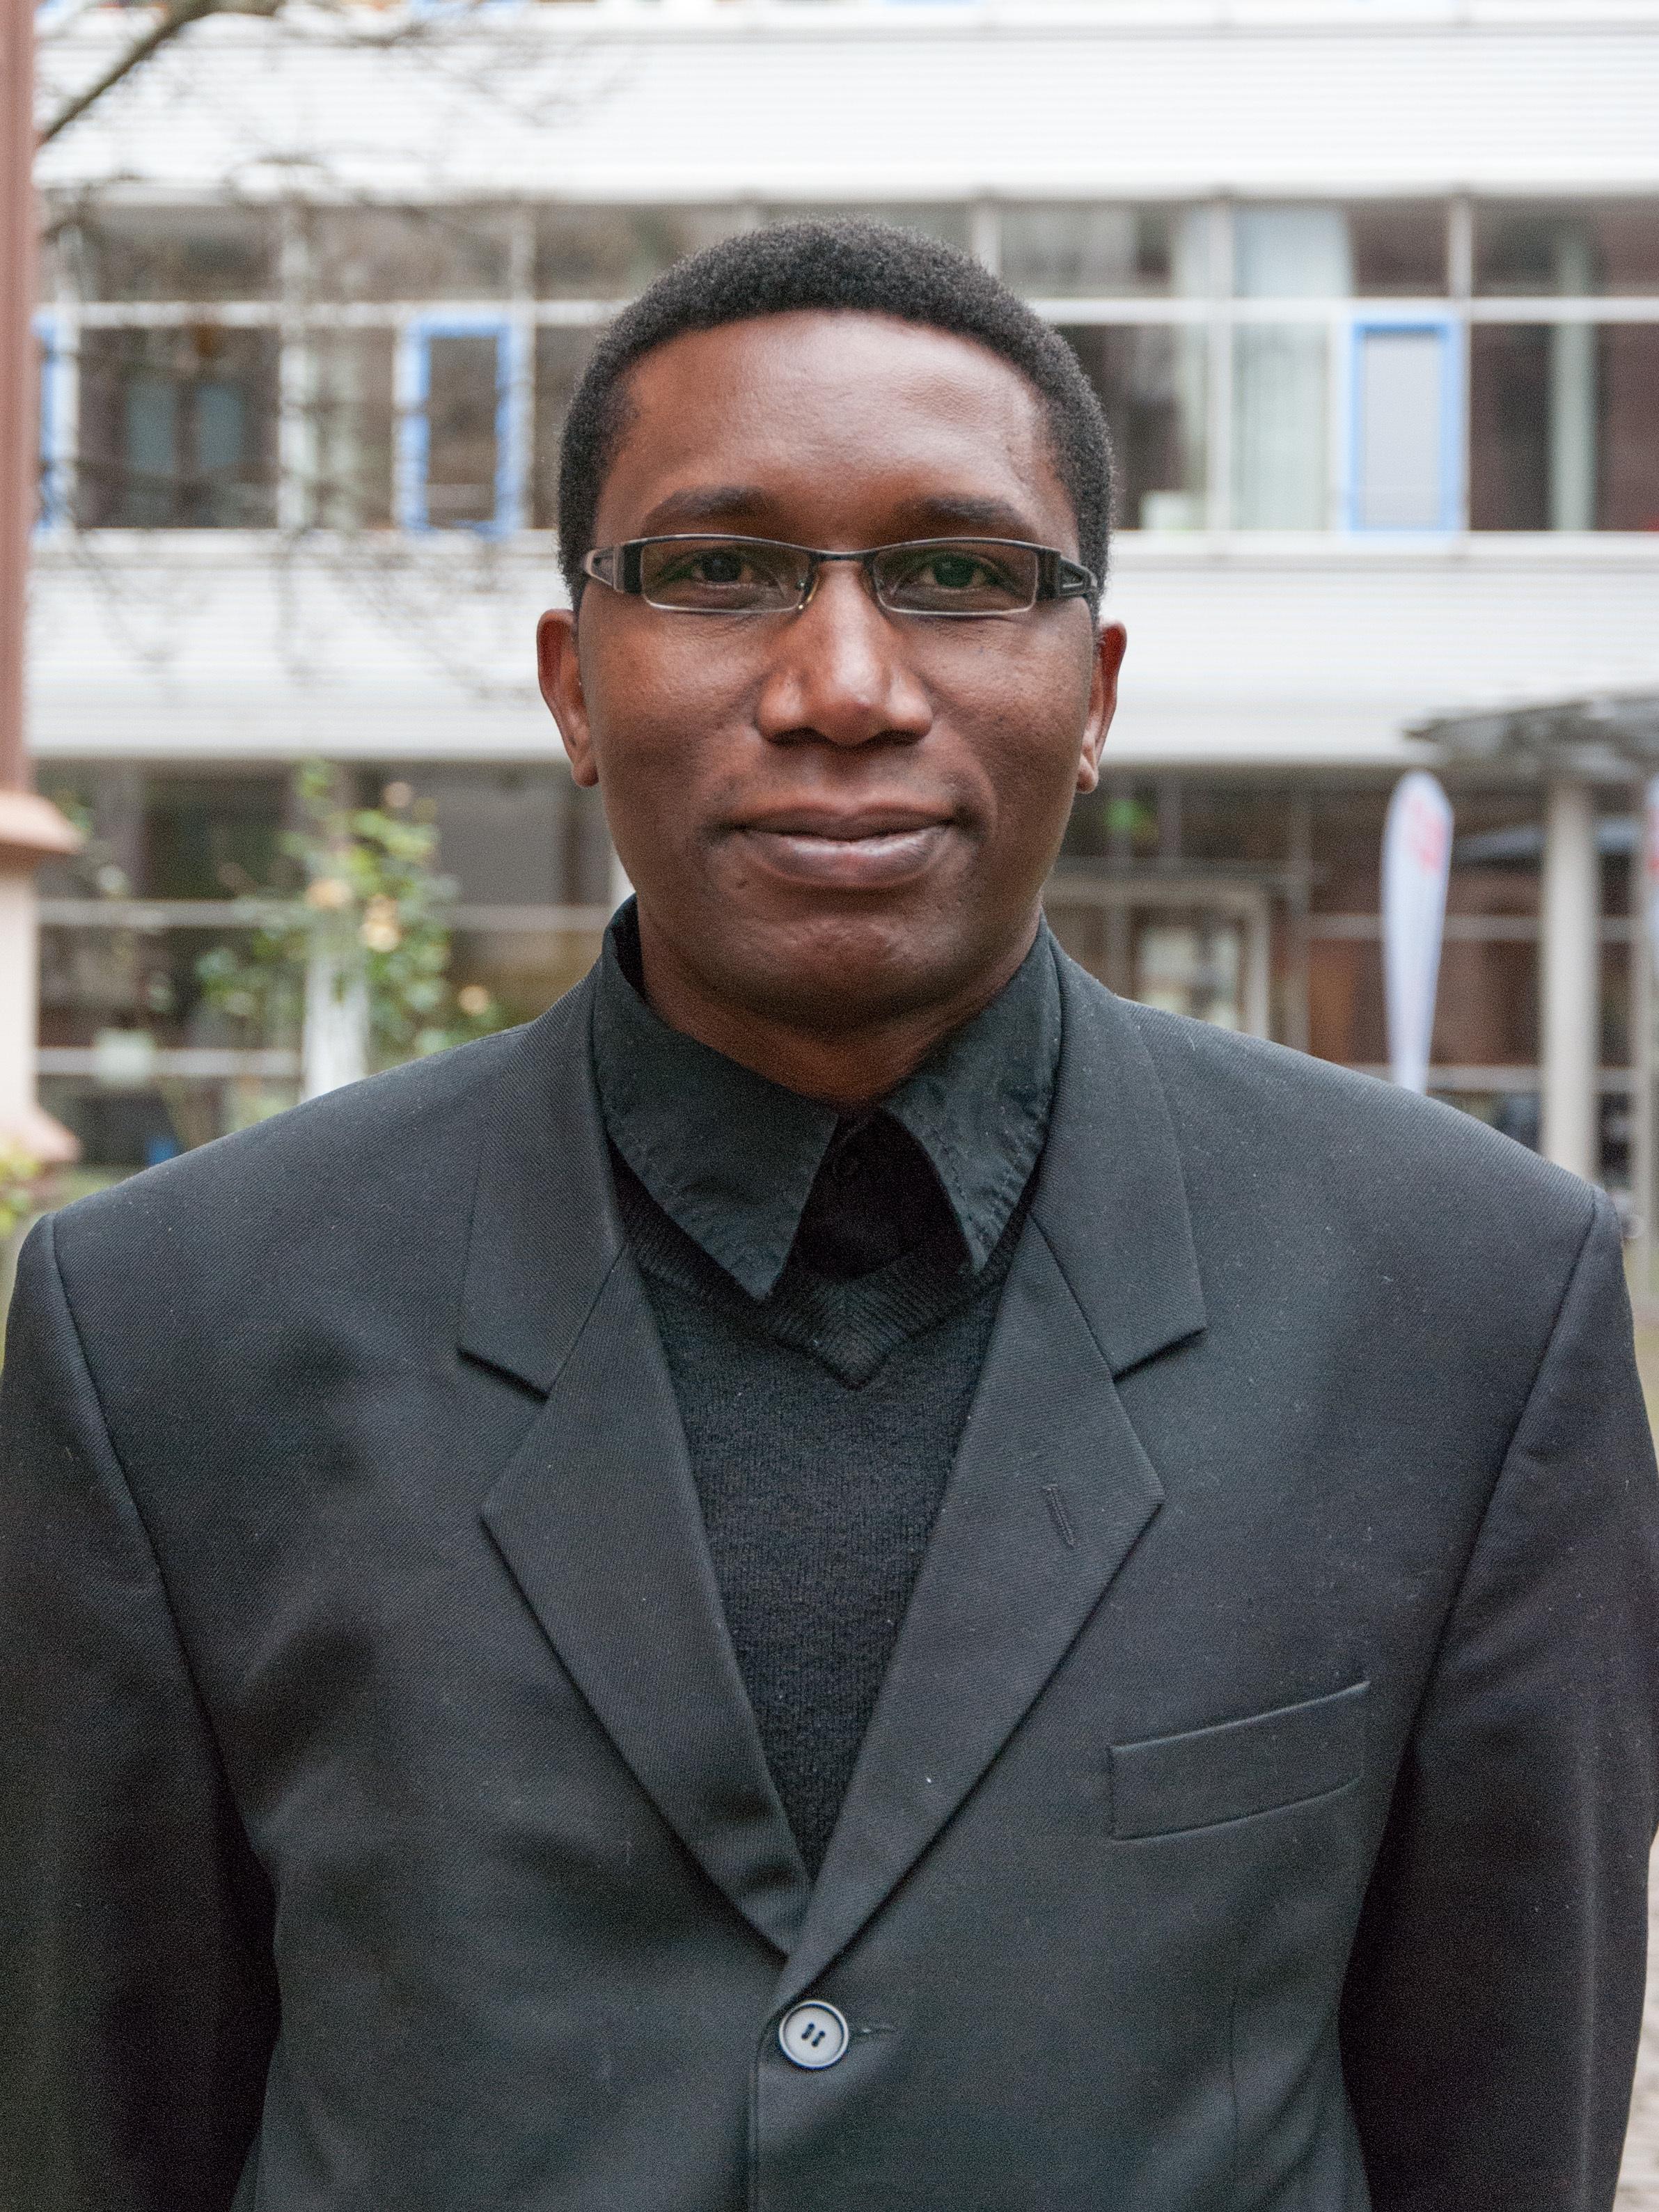 BD-Gerald-Mutarubukwa-20131121-DSC_0690.jpg